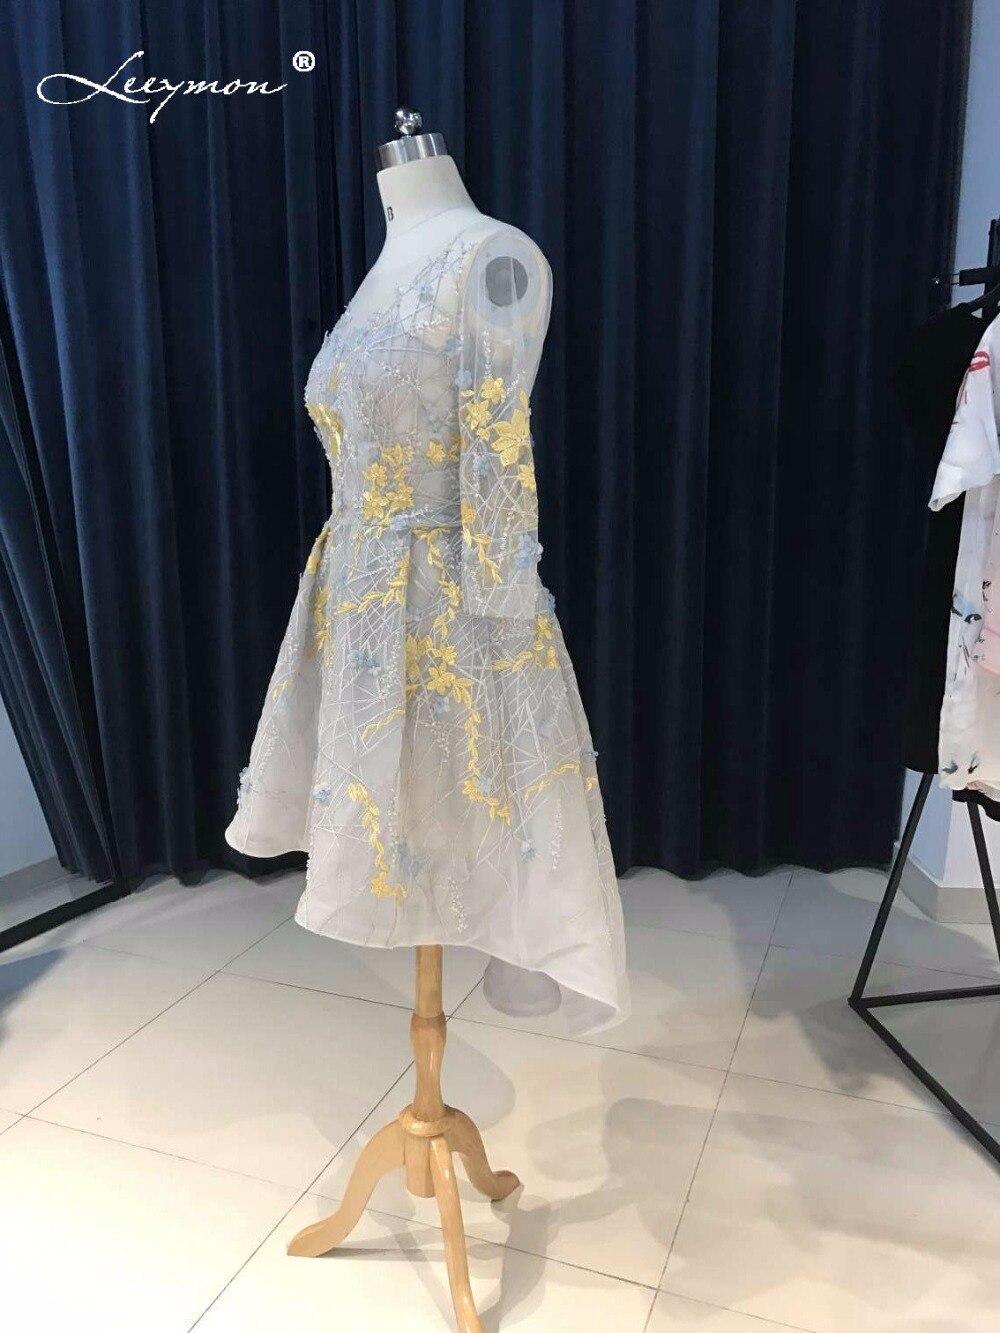 Novi vrući seksi Crystal koktel haljina 2017 Backless čipka kratki - Haljina za posebne prigode - Foto 4